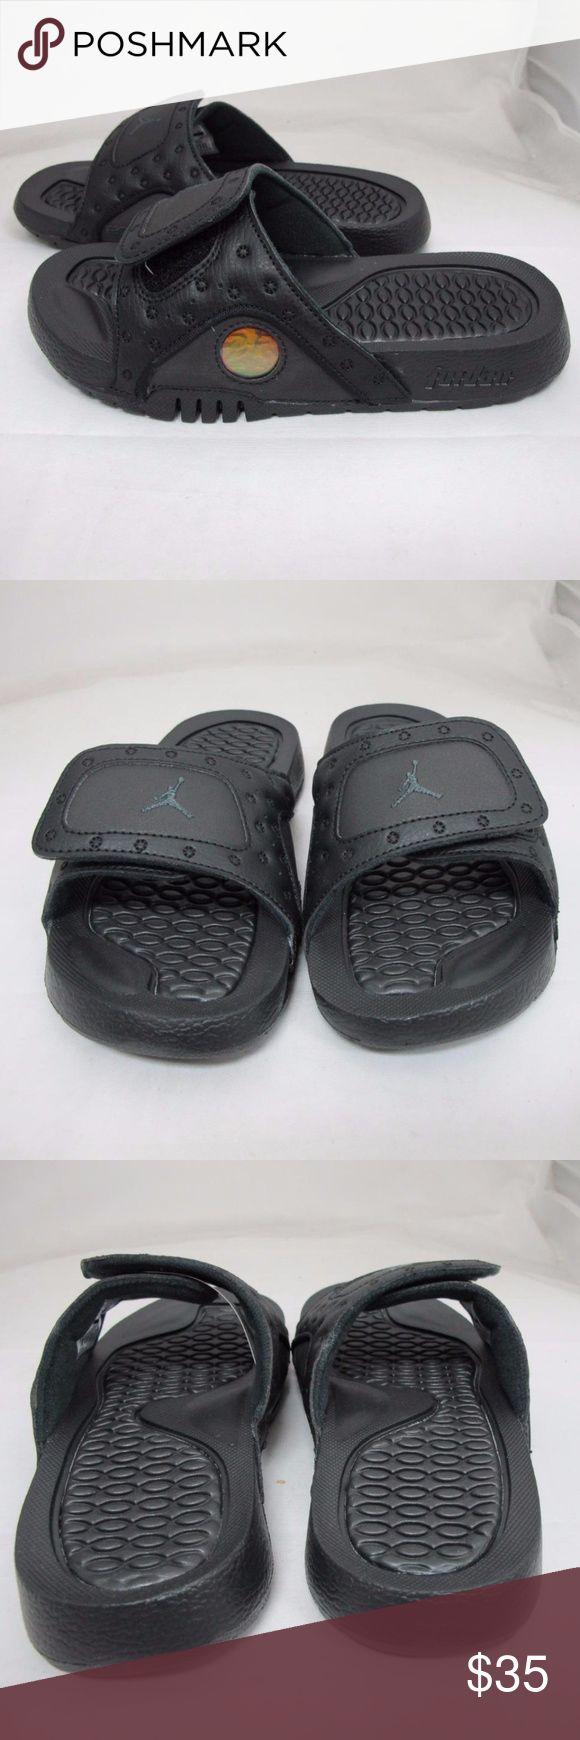 "Jordan "" New Juniors Jordan Hydro XIII Retro "" 684920 011 New Never Been Worn comes with original box Jordan Shoes Sandals & Flip Flops"